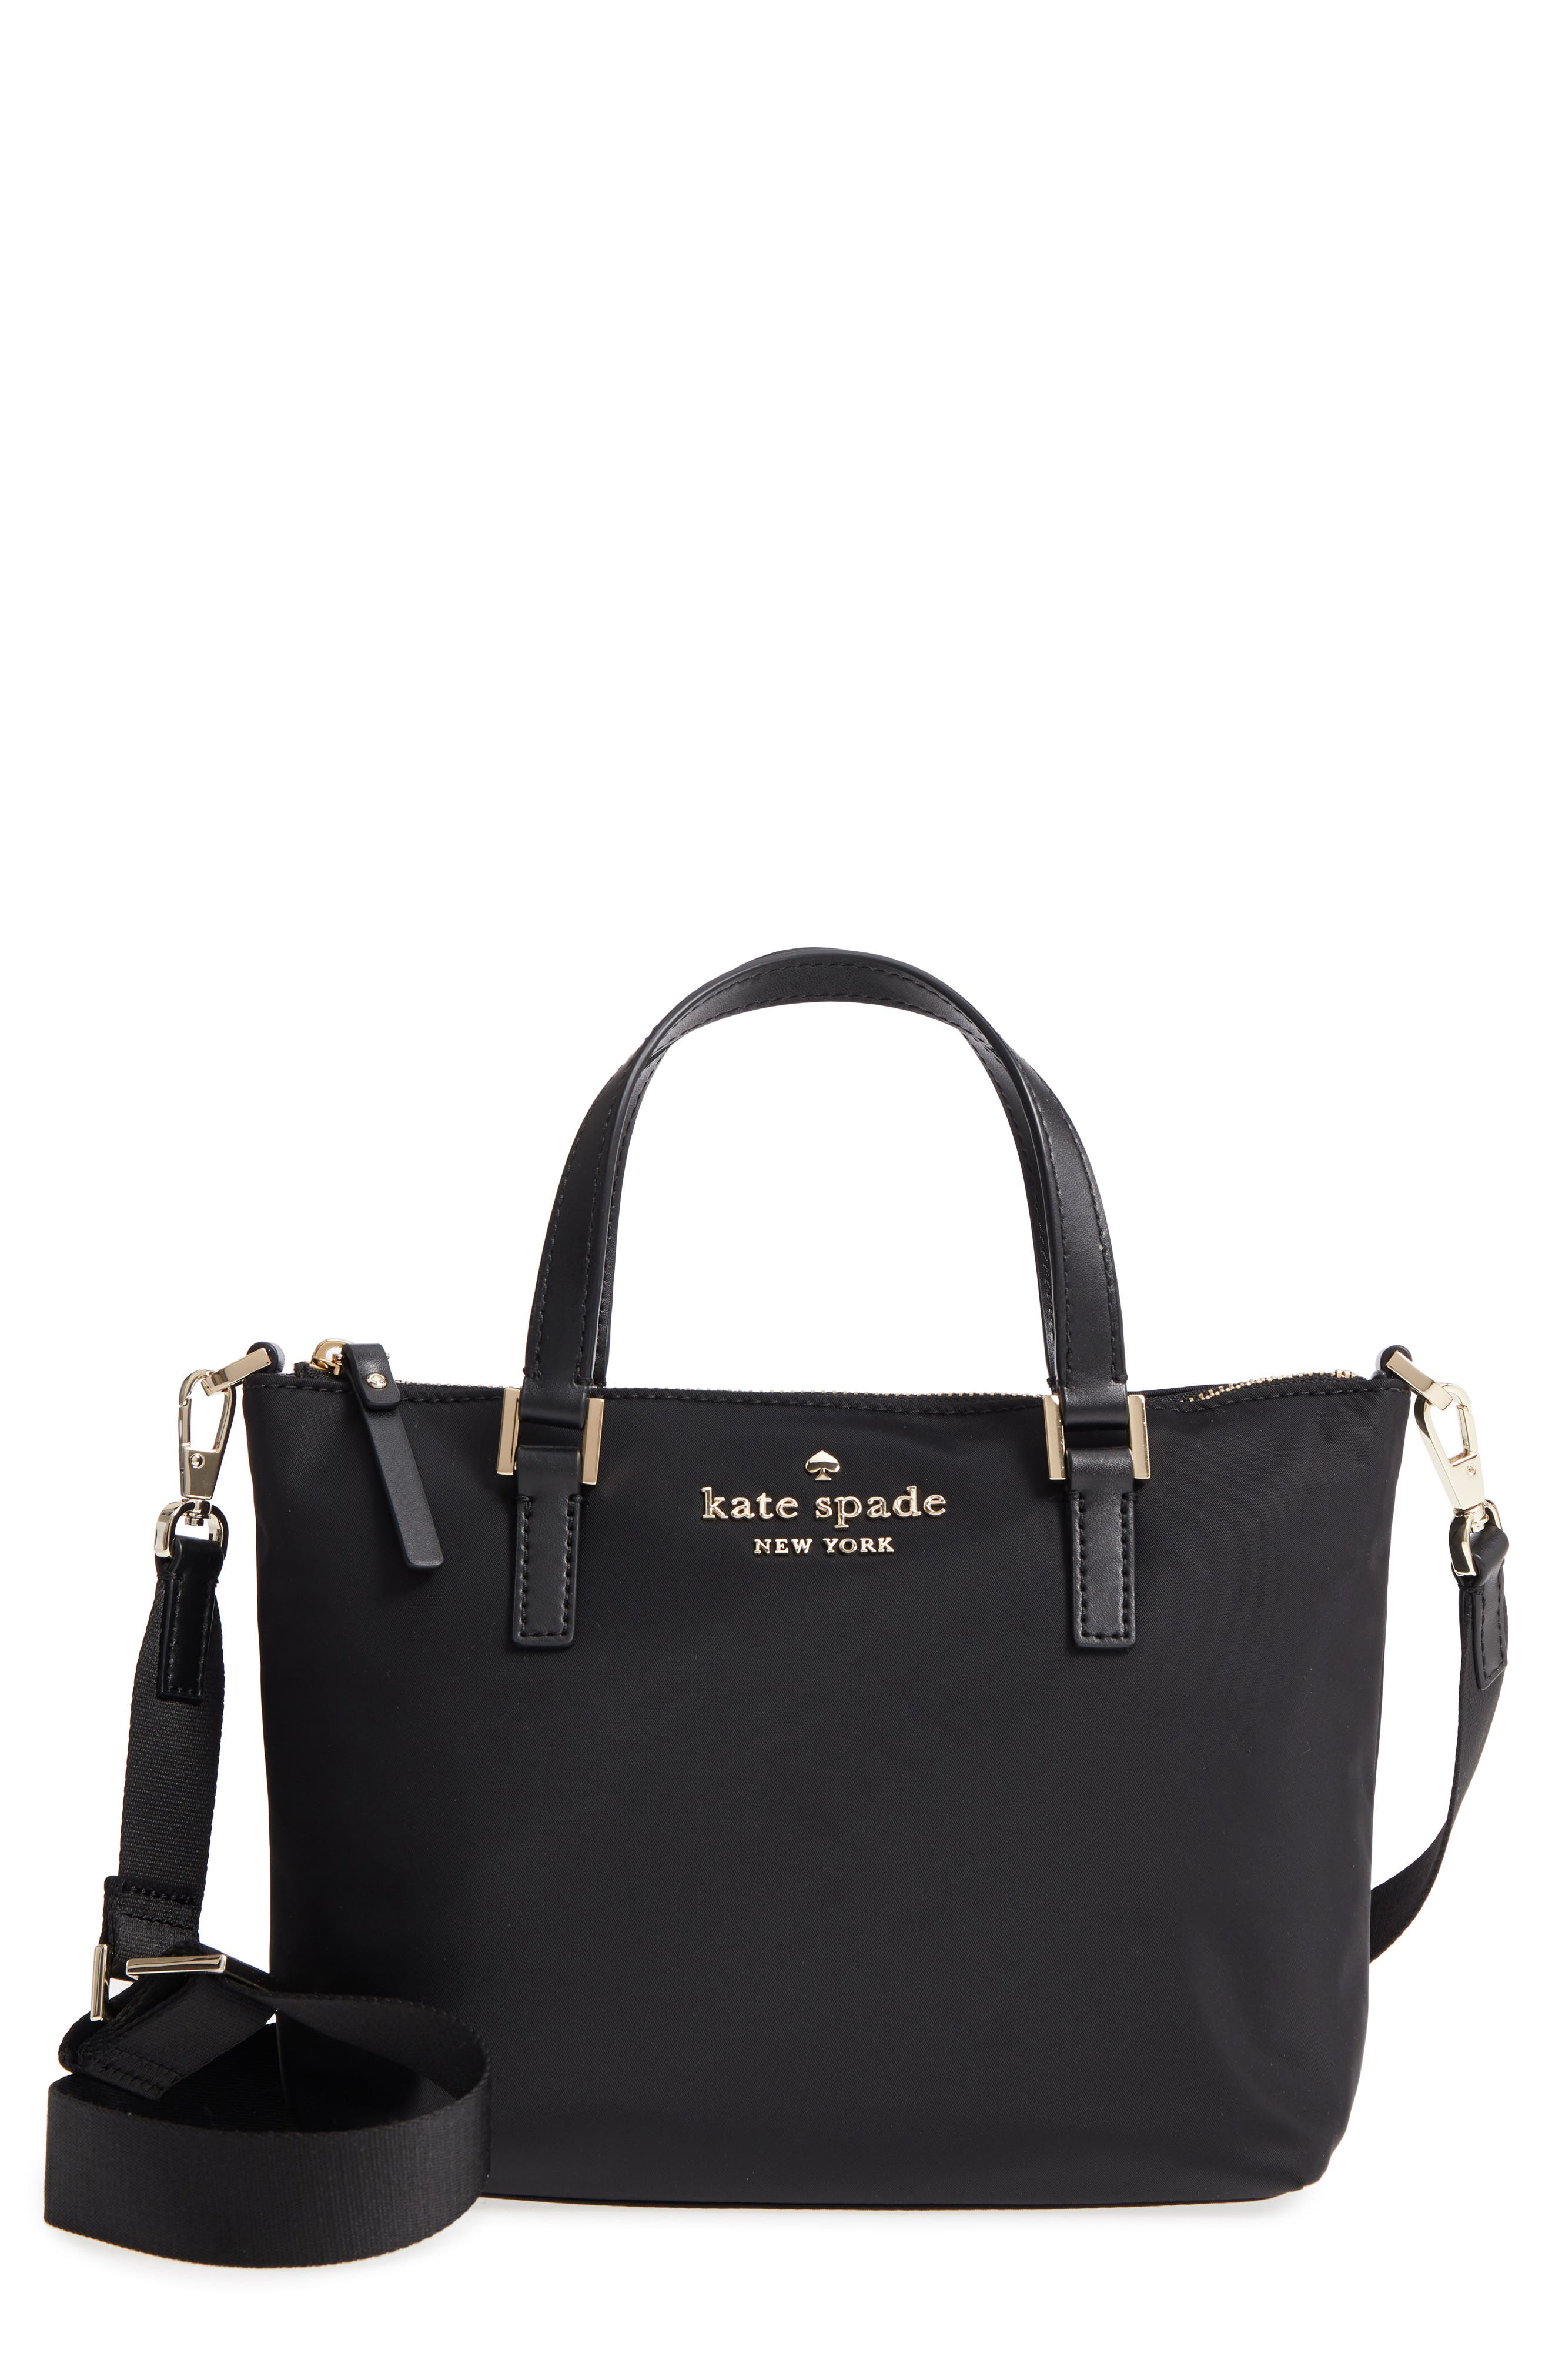 watson lane - lucie nylon crossbody bag, Main, color, BLACK